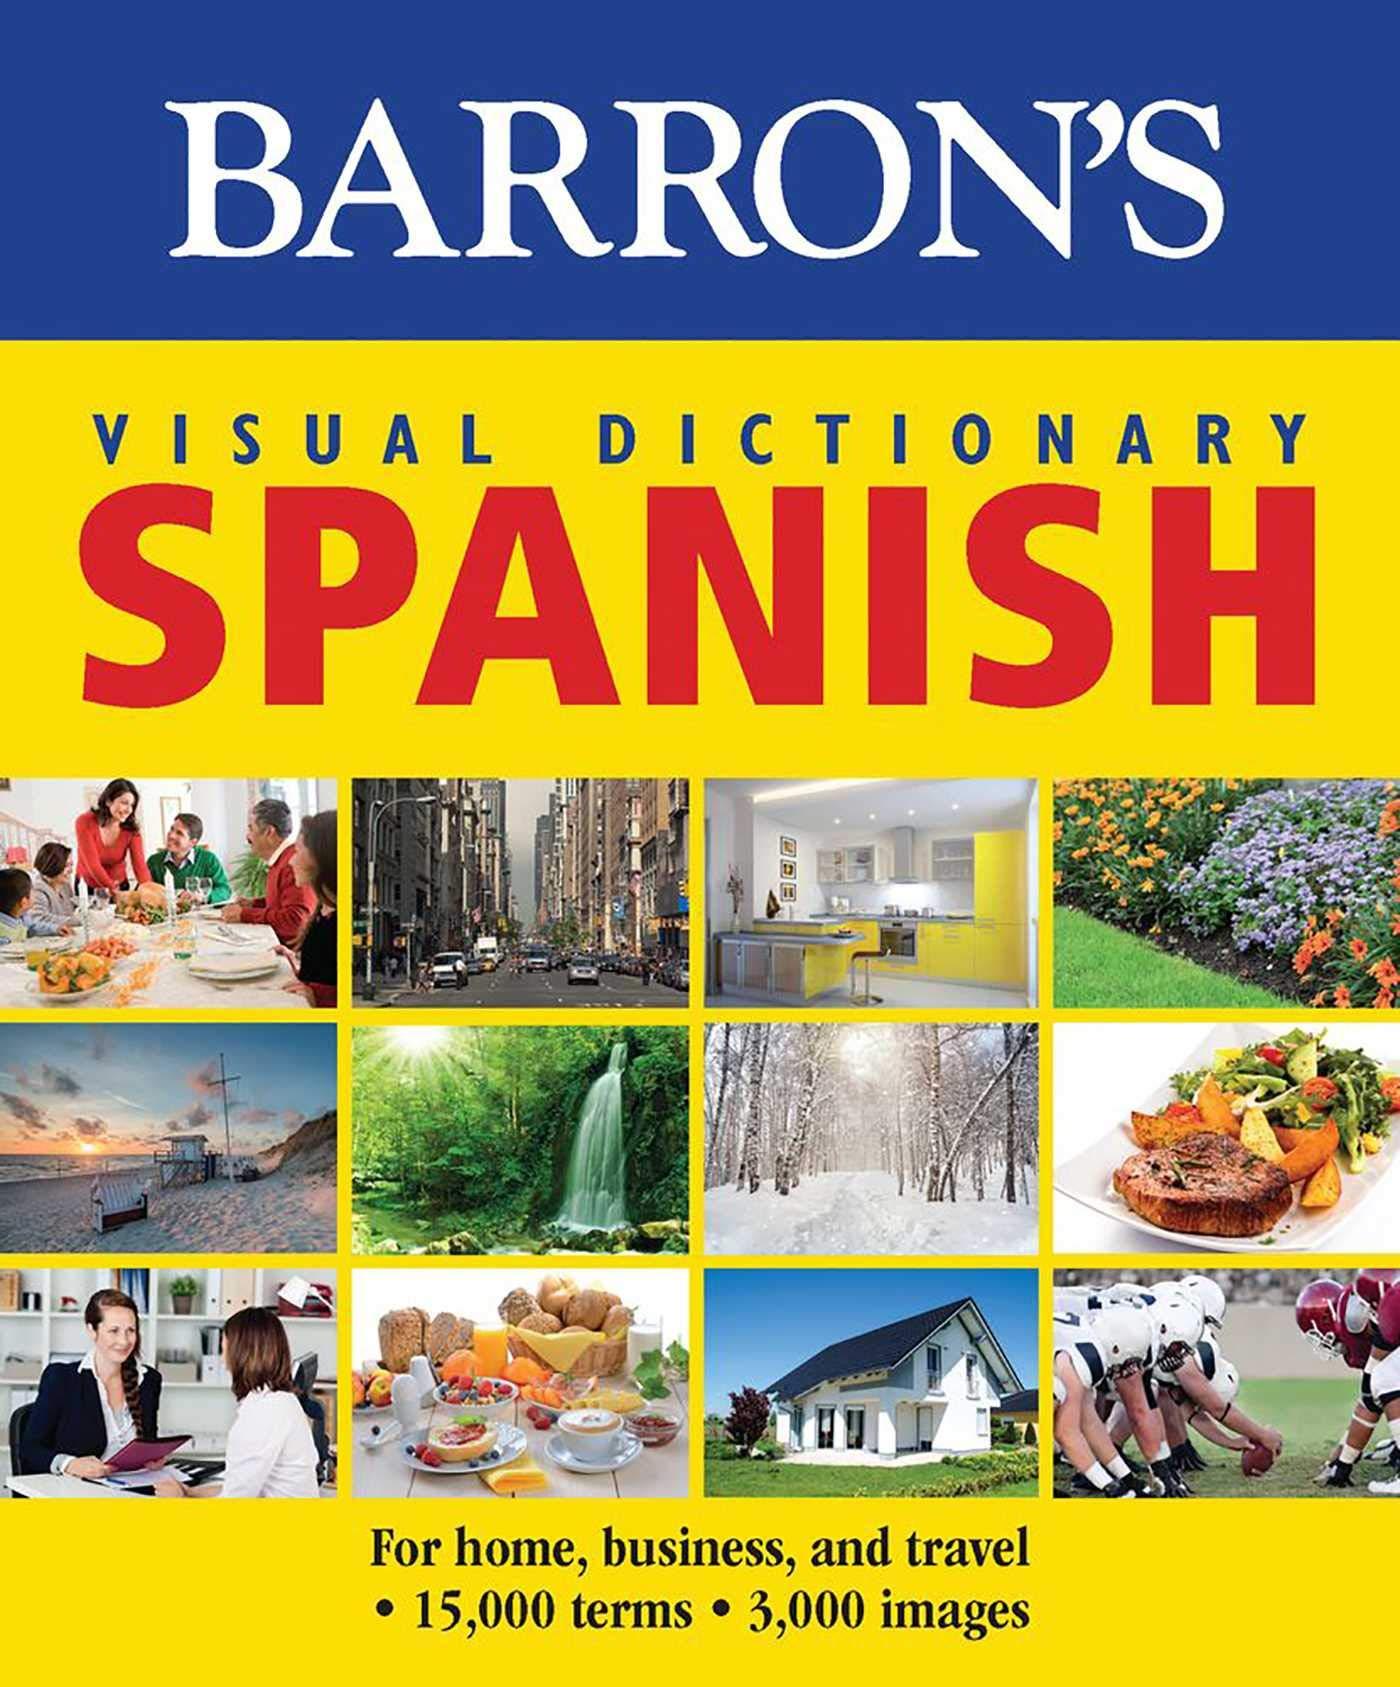 Barrons Visual Dictionary: Spanish: For Home, Business, and Travel (Barrons Visual Dictionaries) Paperback – January 1, 2015